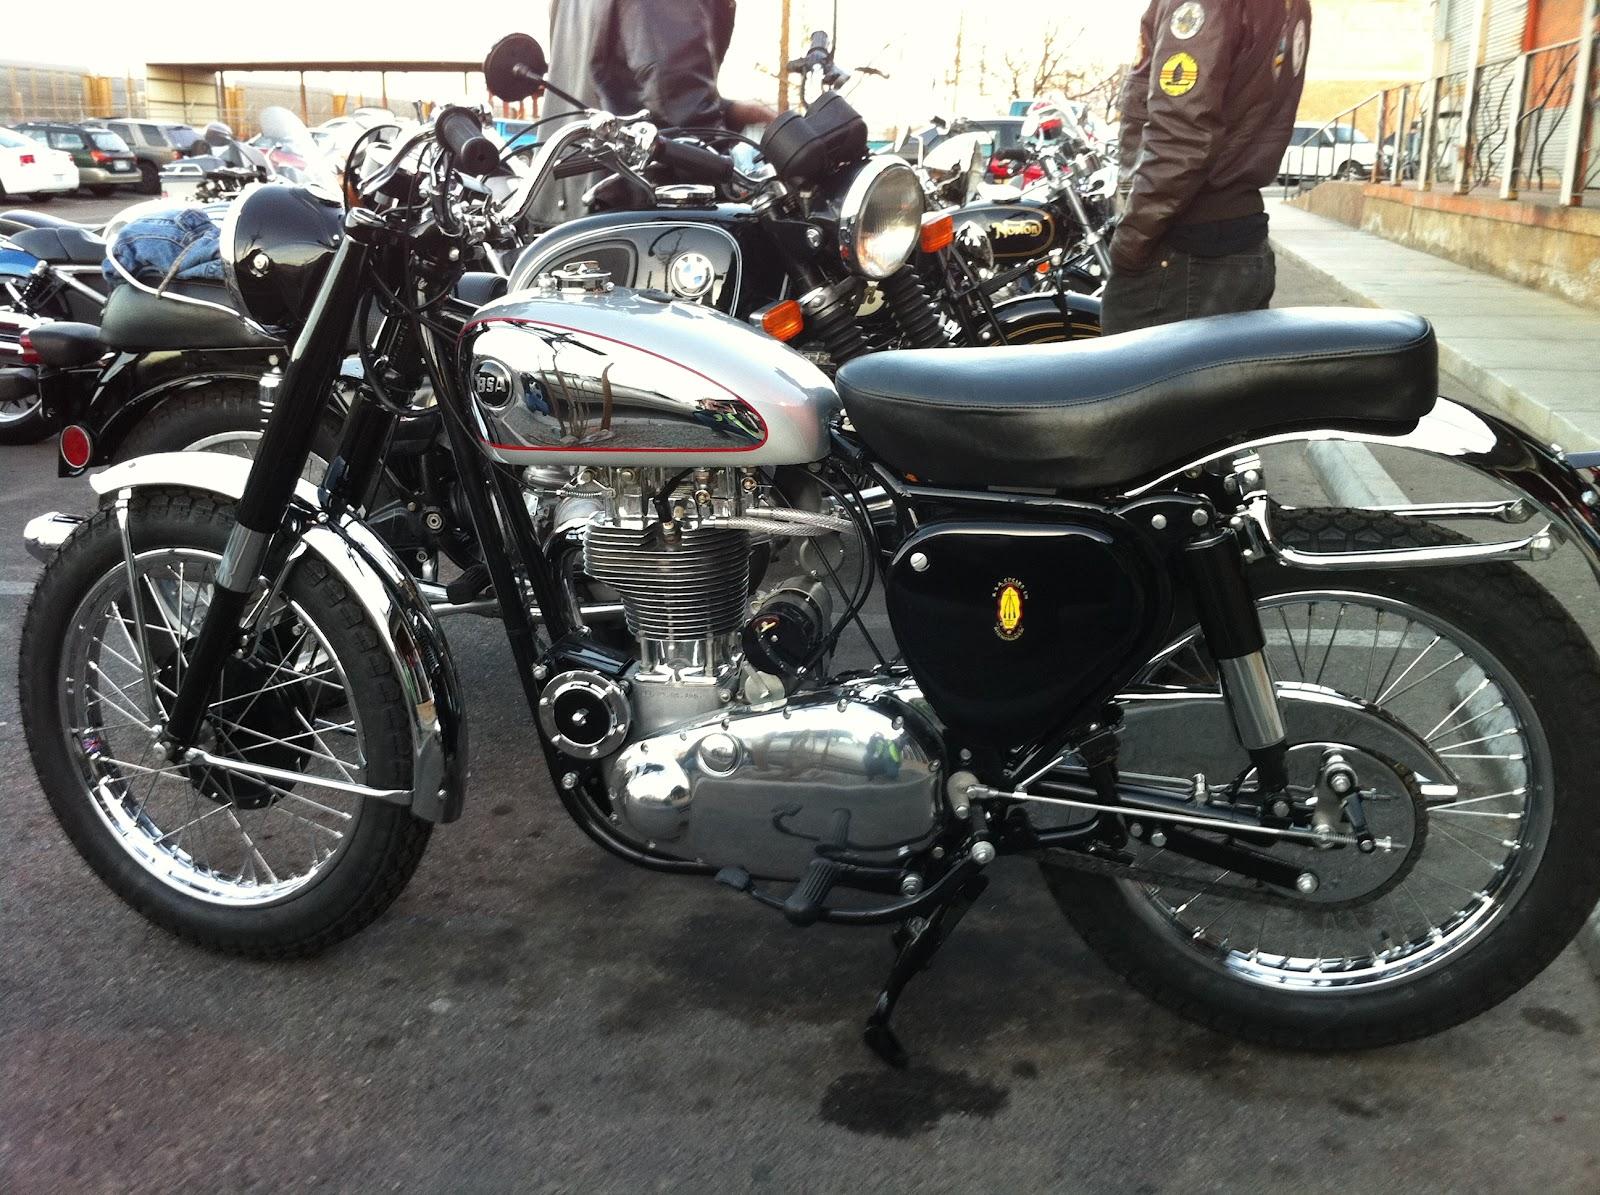 Tucson Bonnie: Tucson Vintage Motorcycle Riders